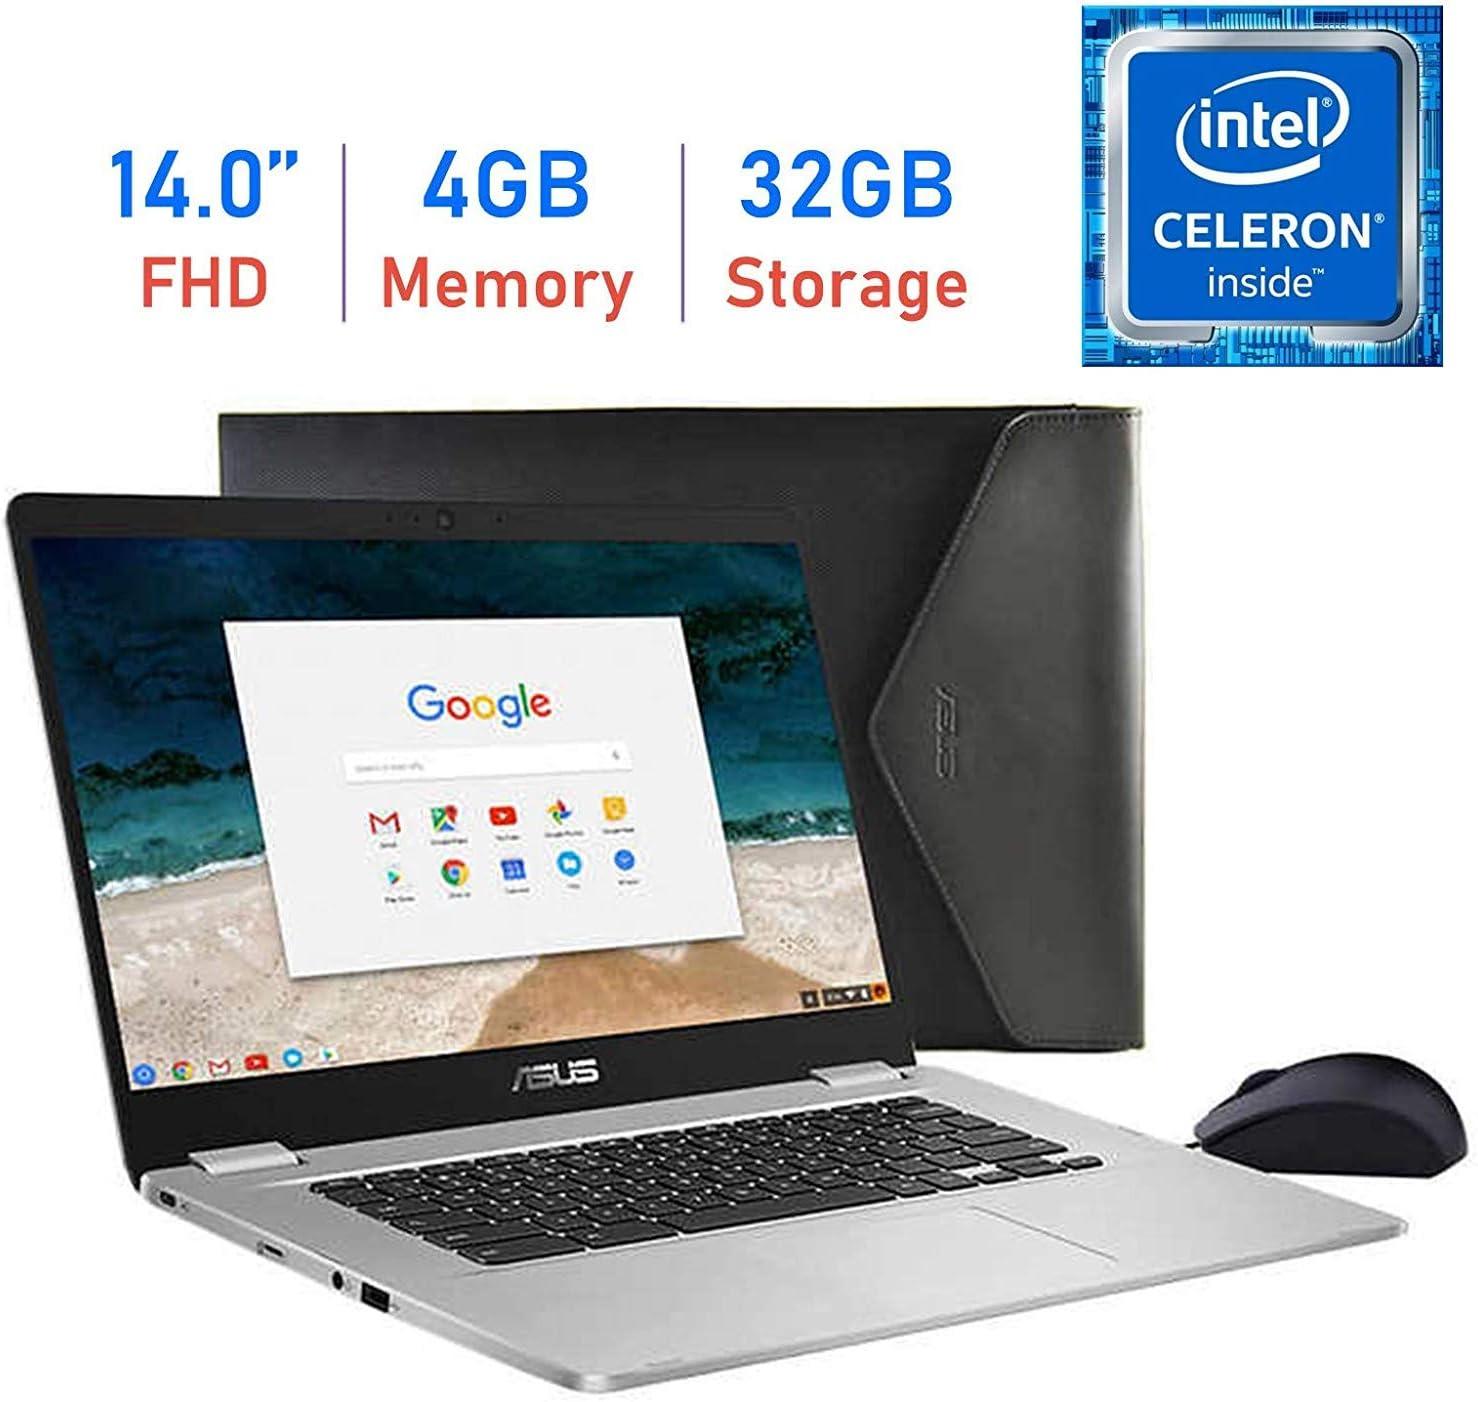 "Latest_ASUS Chromebook 14"" FHD (1920x1080) Laptop, Intel Dual-Core Celeron N3350 Processor, 4GB RAM, 32GB eMMC, 180° hinge, USB 3.1 Type-C, Media Card Reader, Mouse and Sleeve Included,ChromeOS"